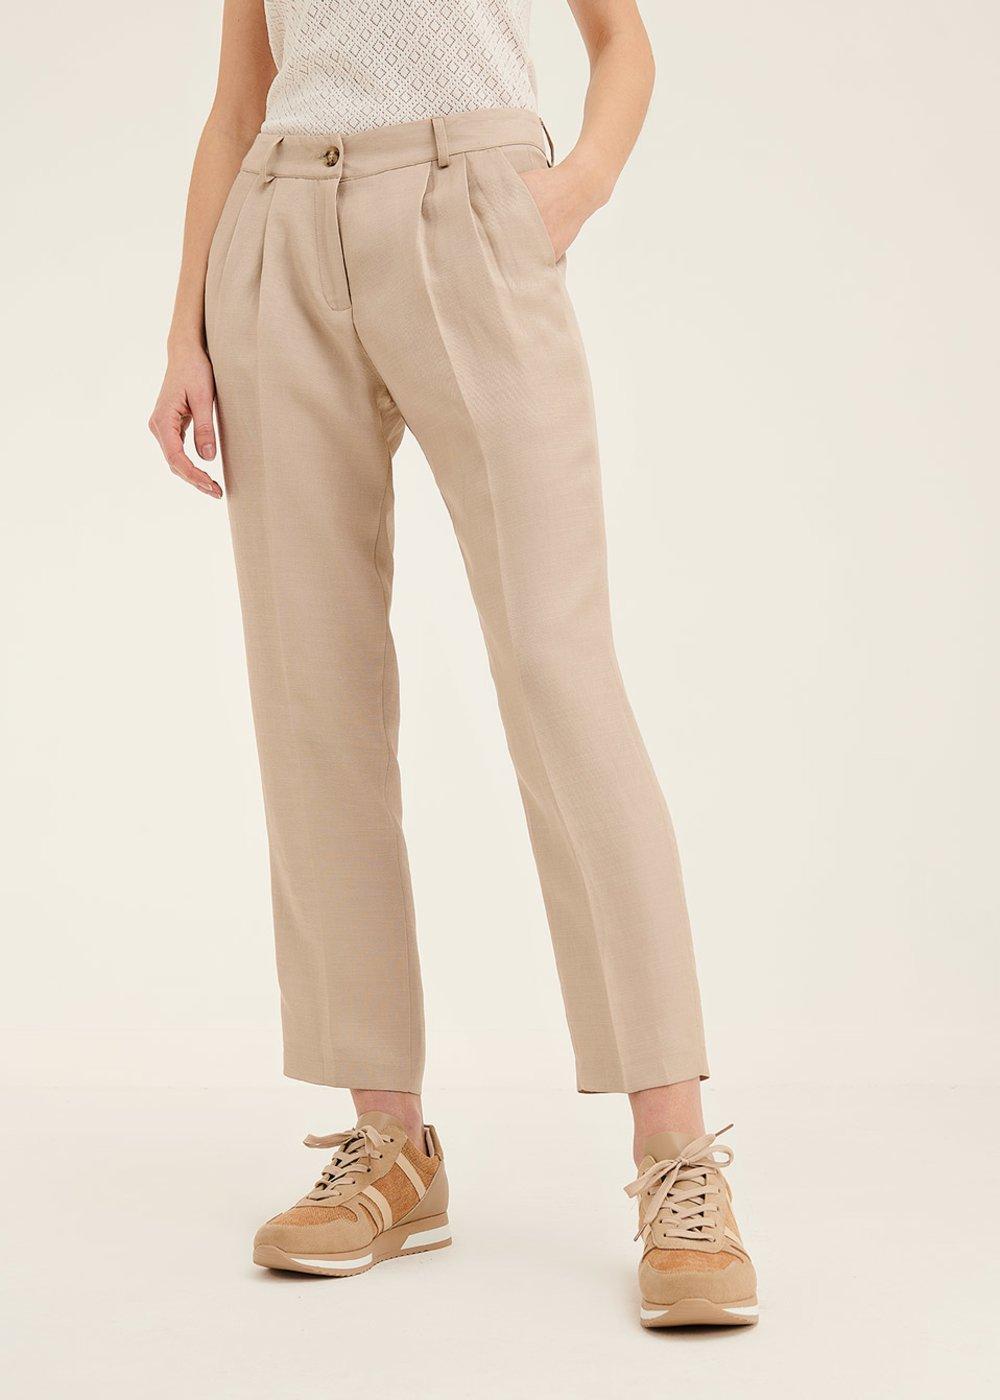 Gigi viscose trousers with darts - Safari - Woman